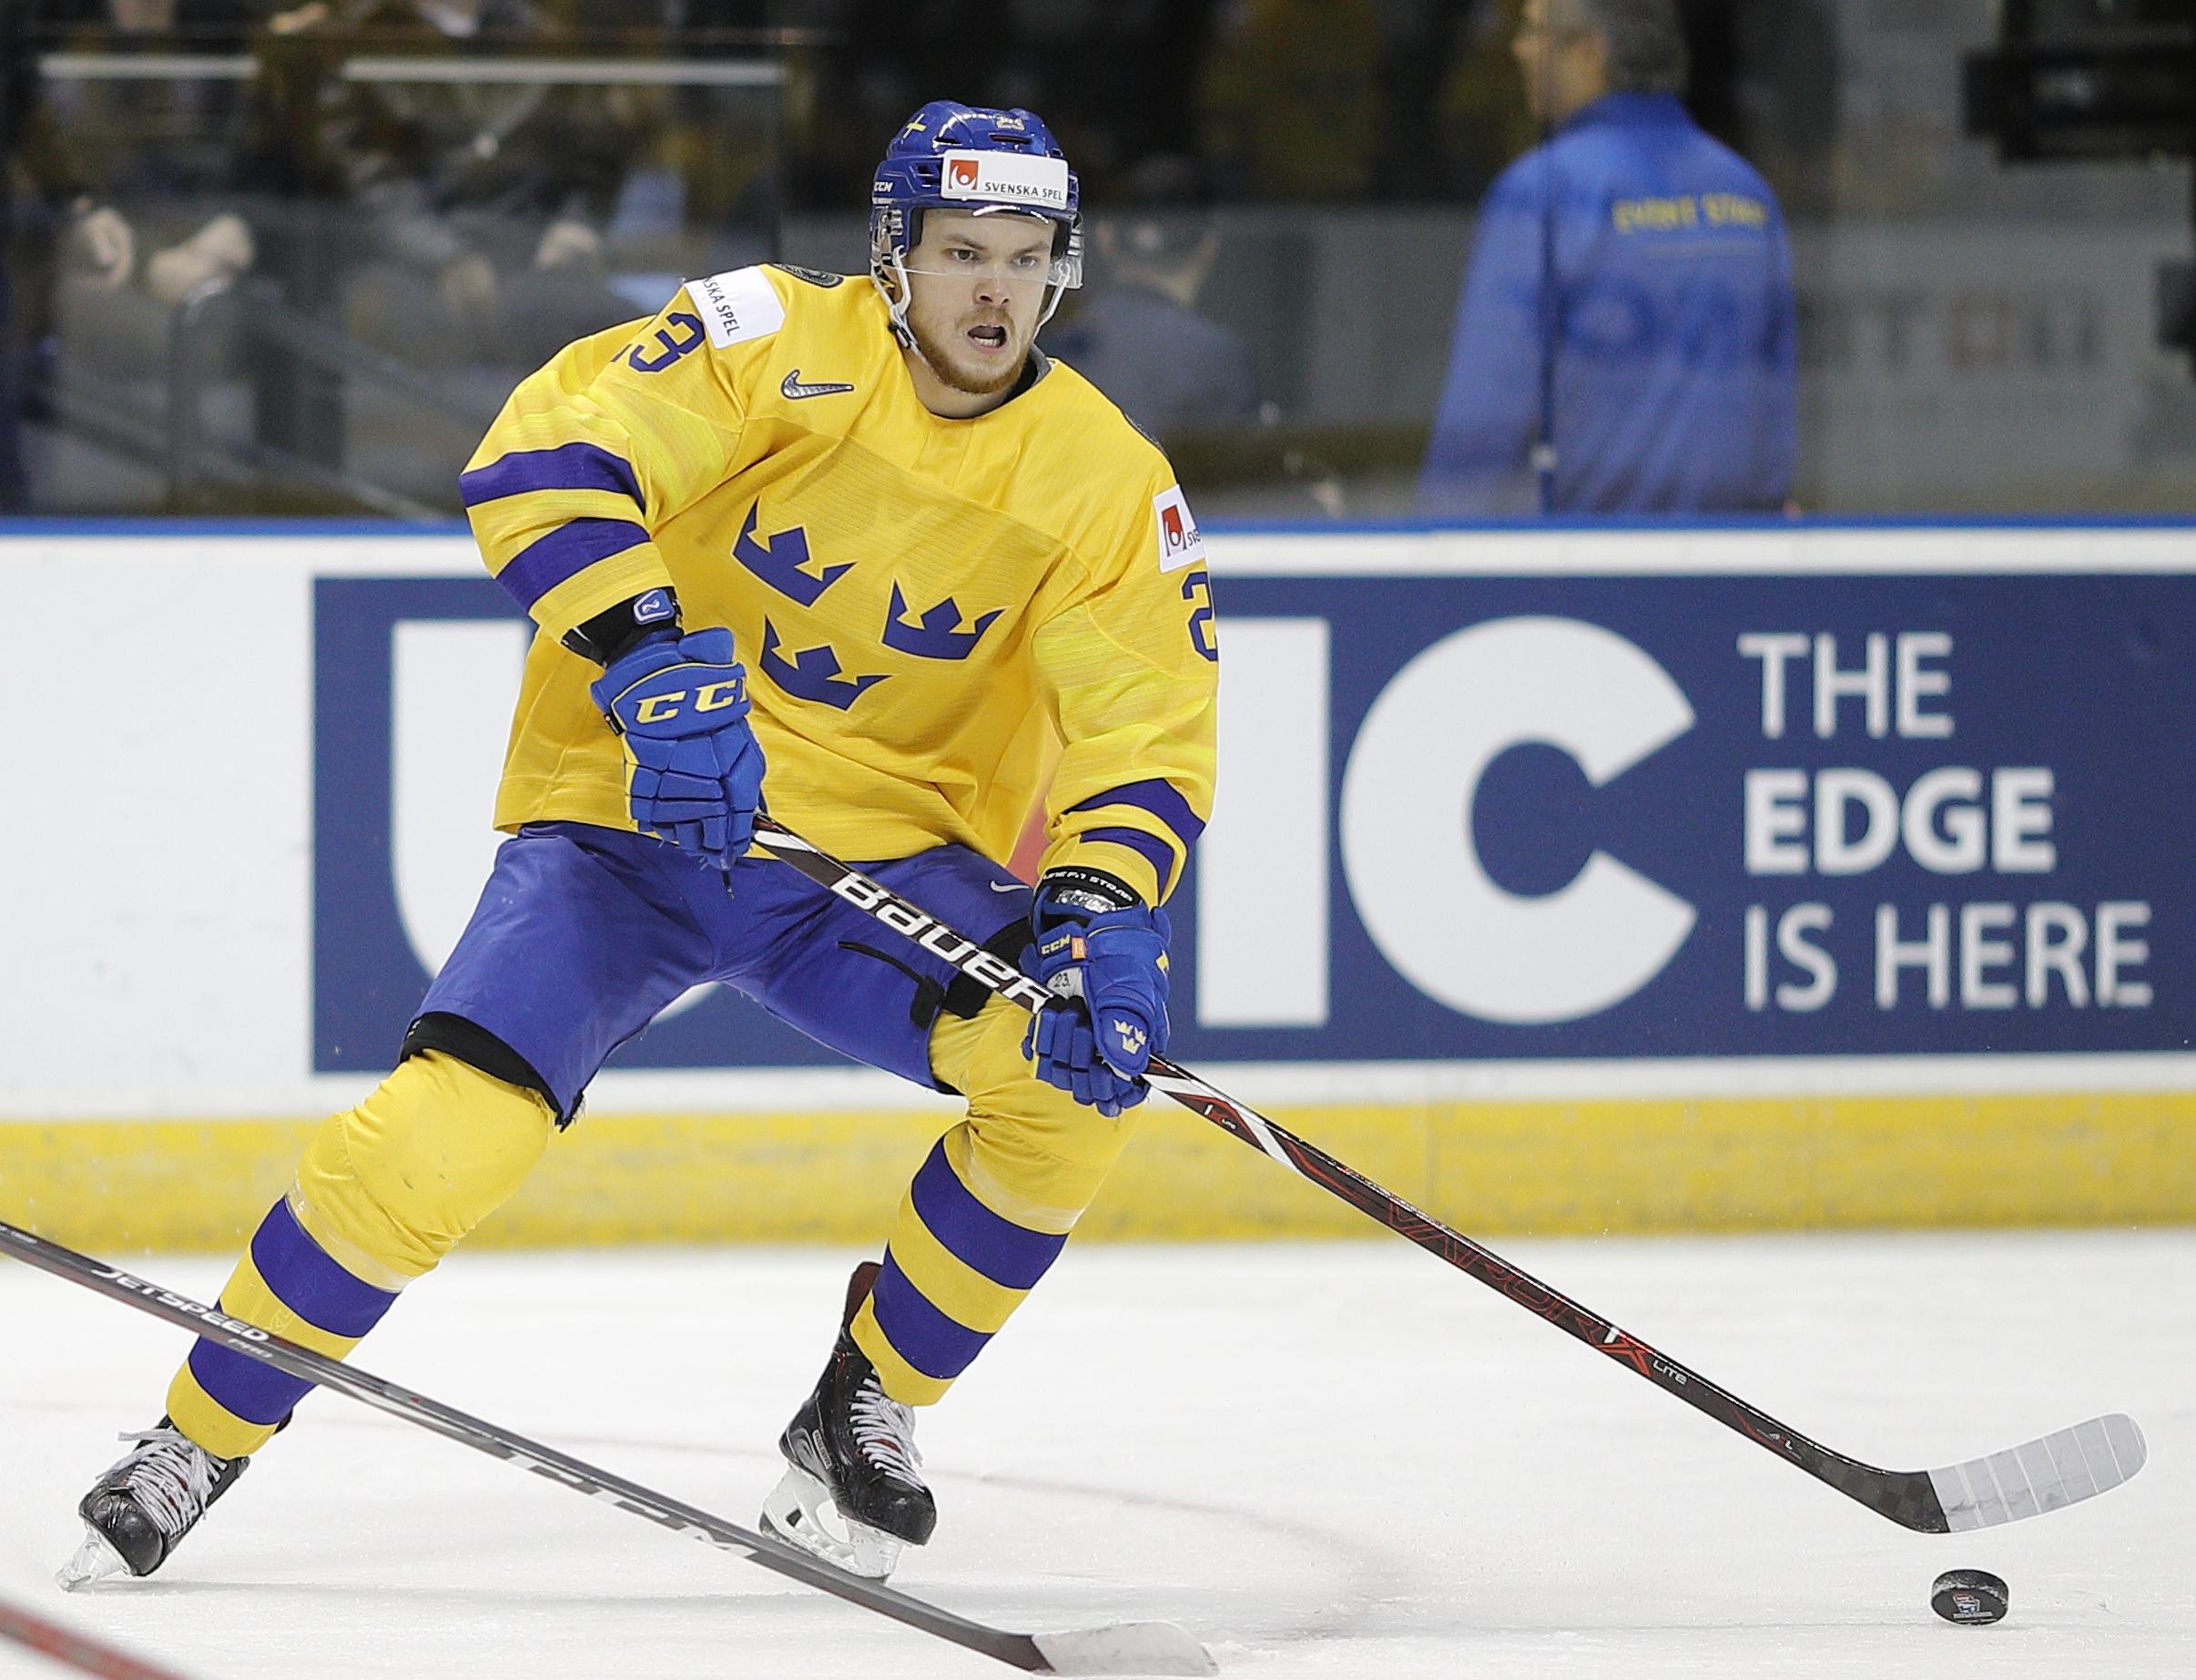 Sweden v Kazakhstan - 2019 IIHF World Junior Championship